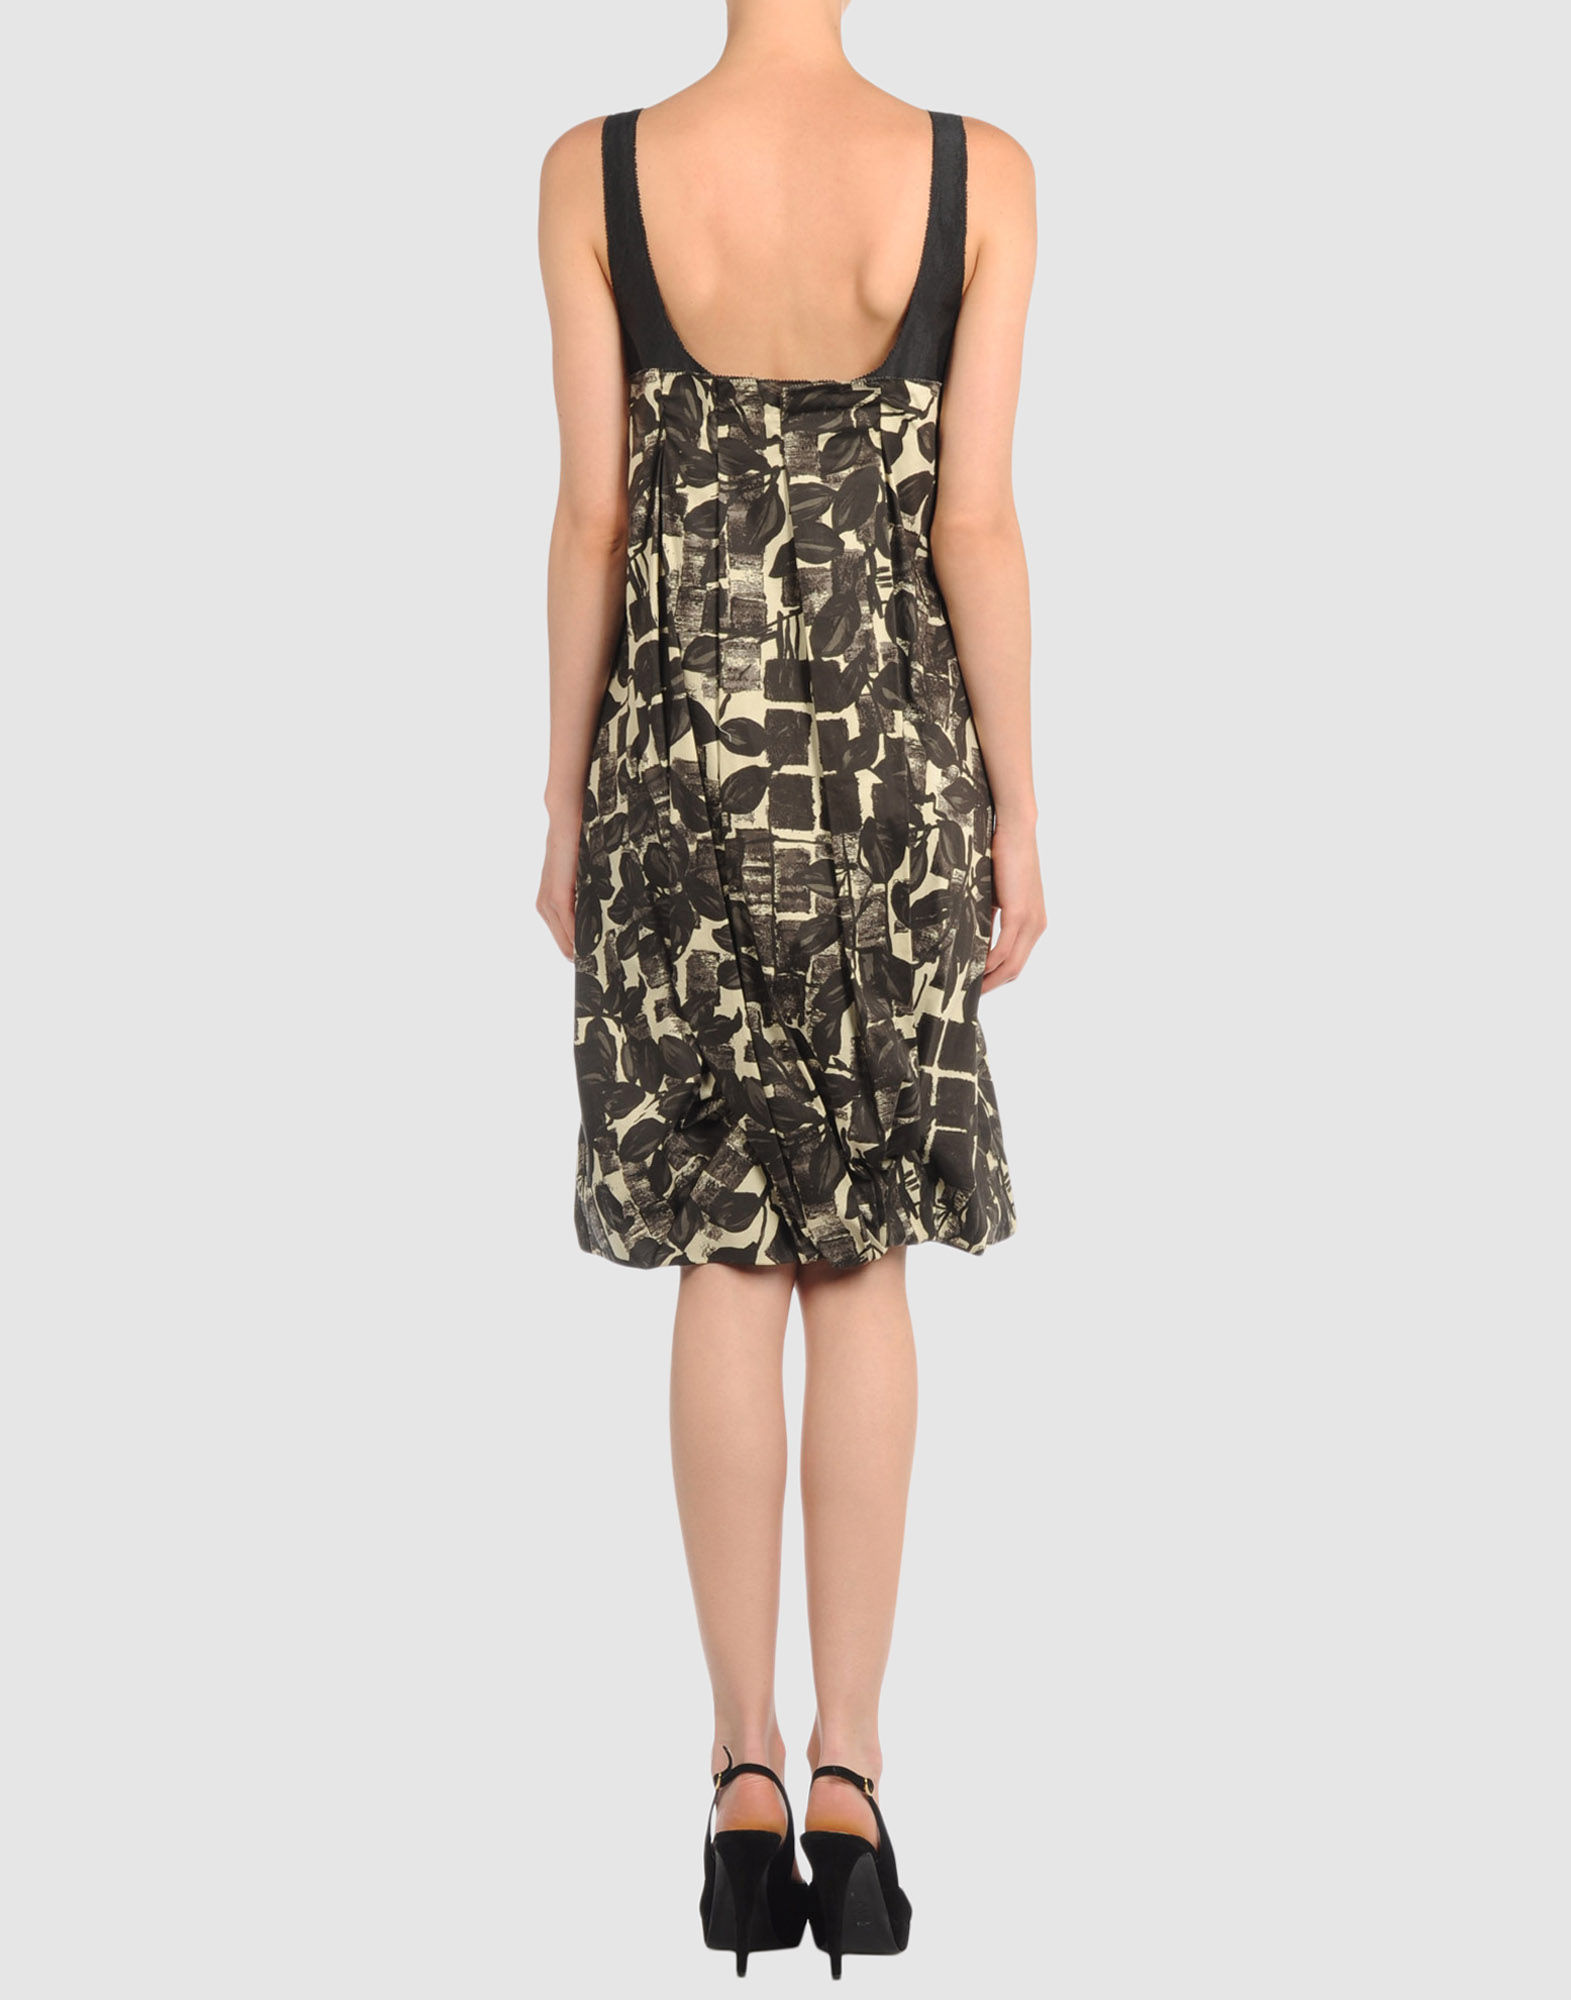 34180420DH 14 r - Evening Φορεματα Vera Wang 2011 2012 Κωδ.01